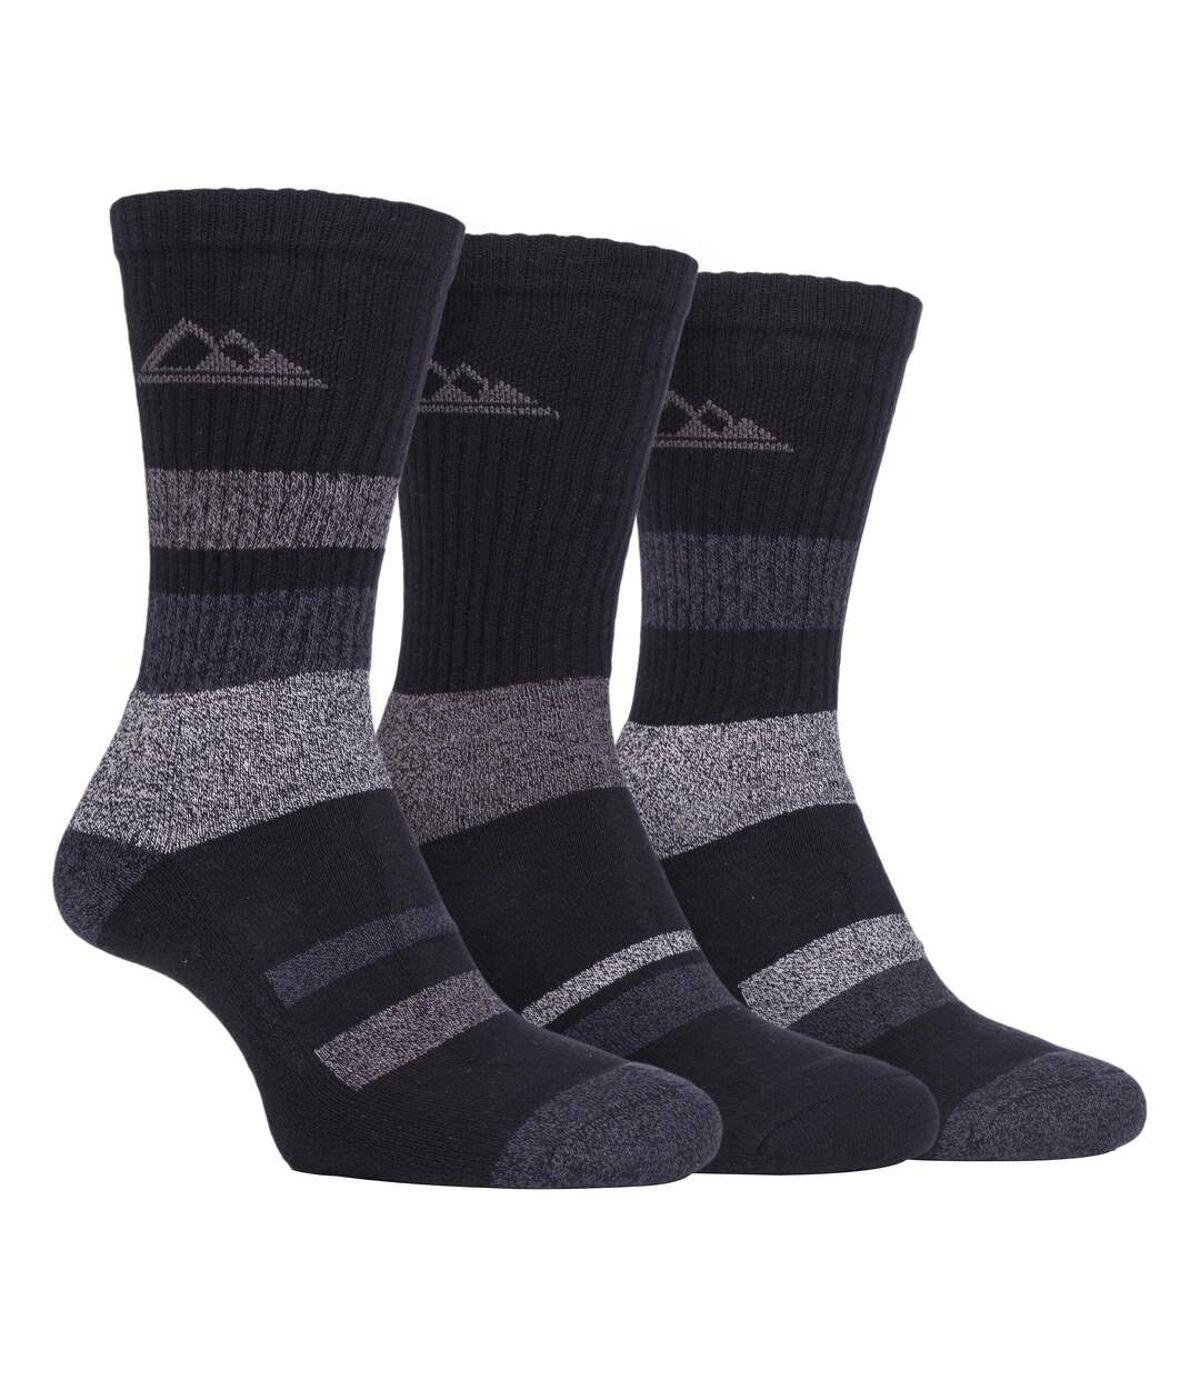 3 Pack Mens Lightweight Cotton Hiking Socks